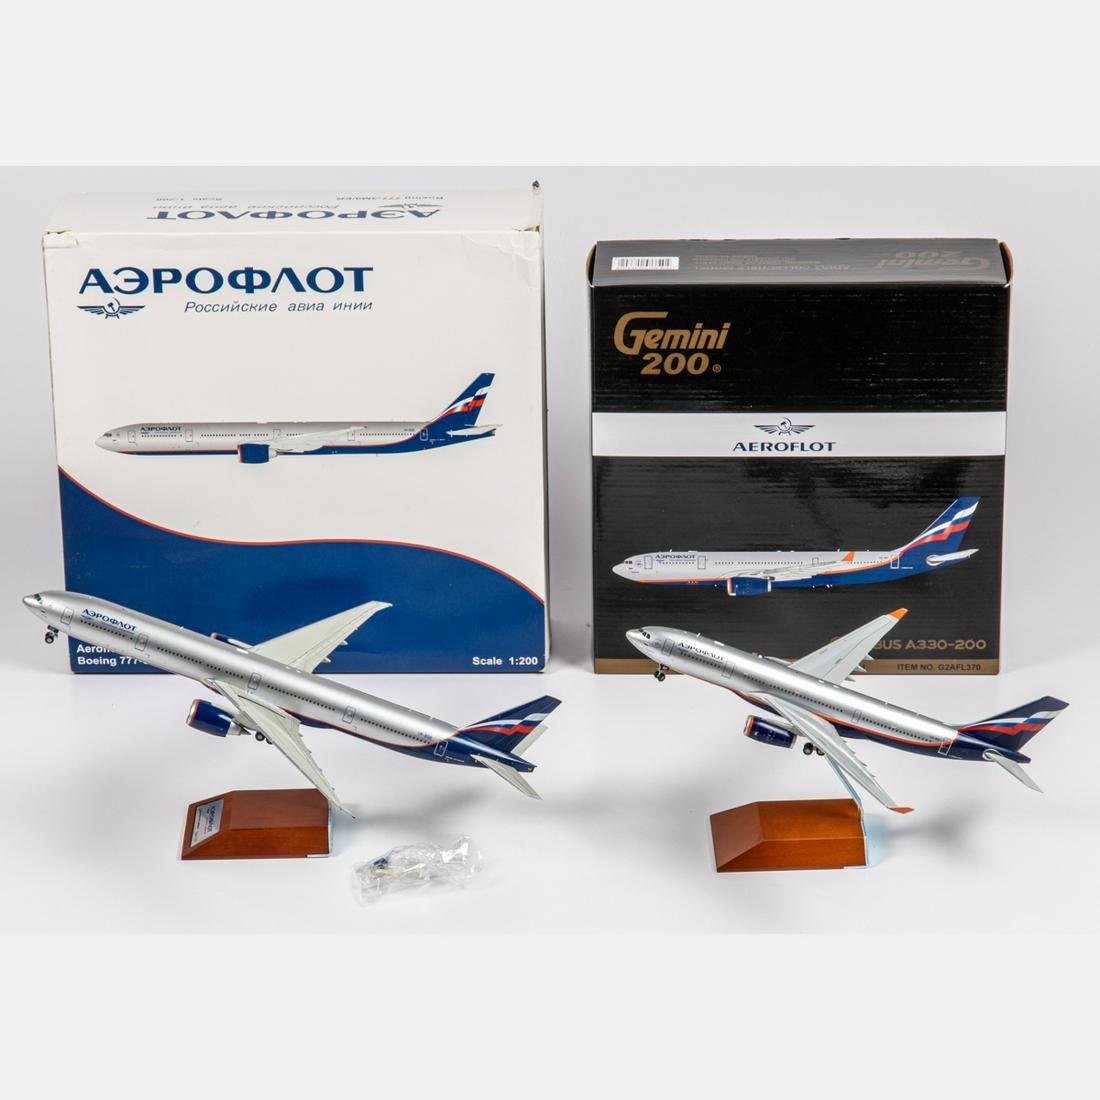 Two Aeroflot Diecast Airplanes